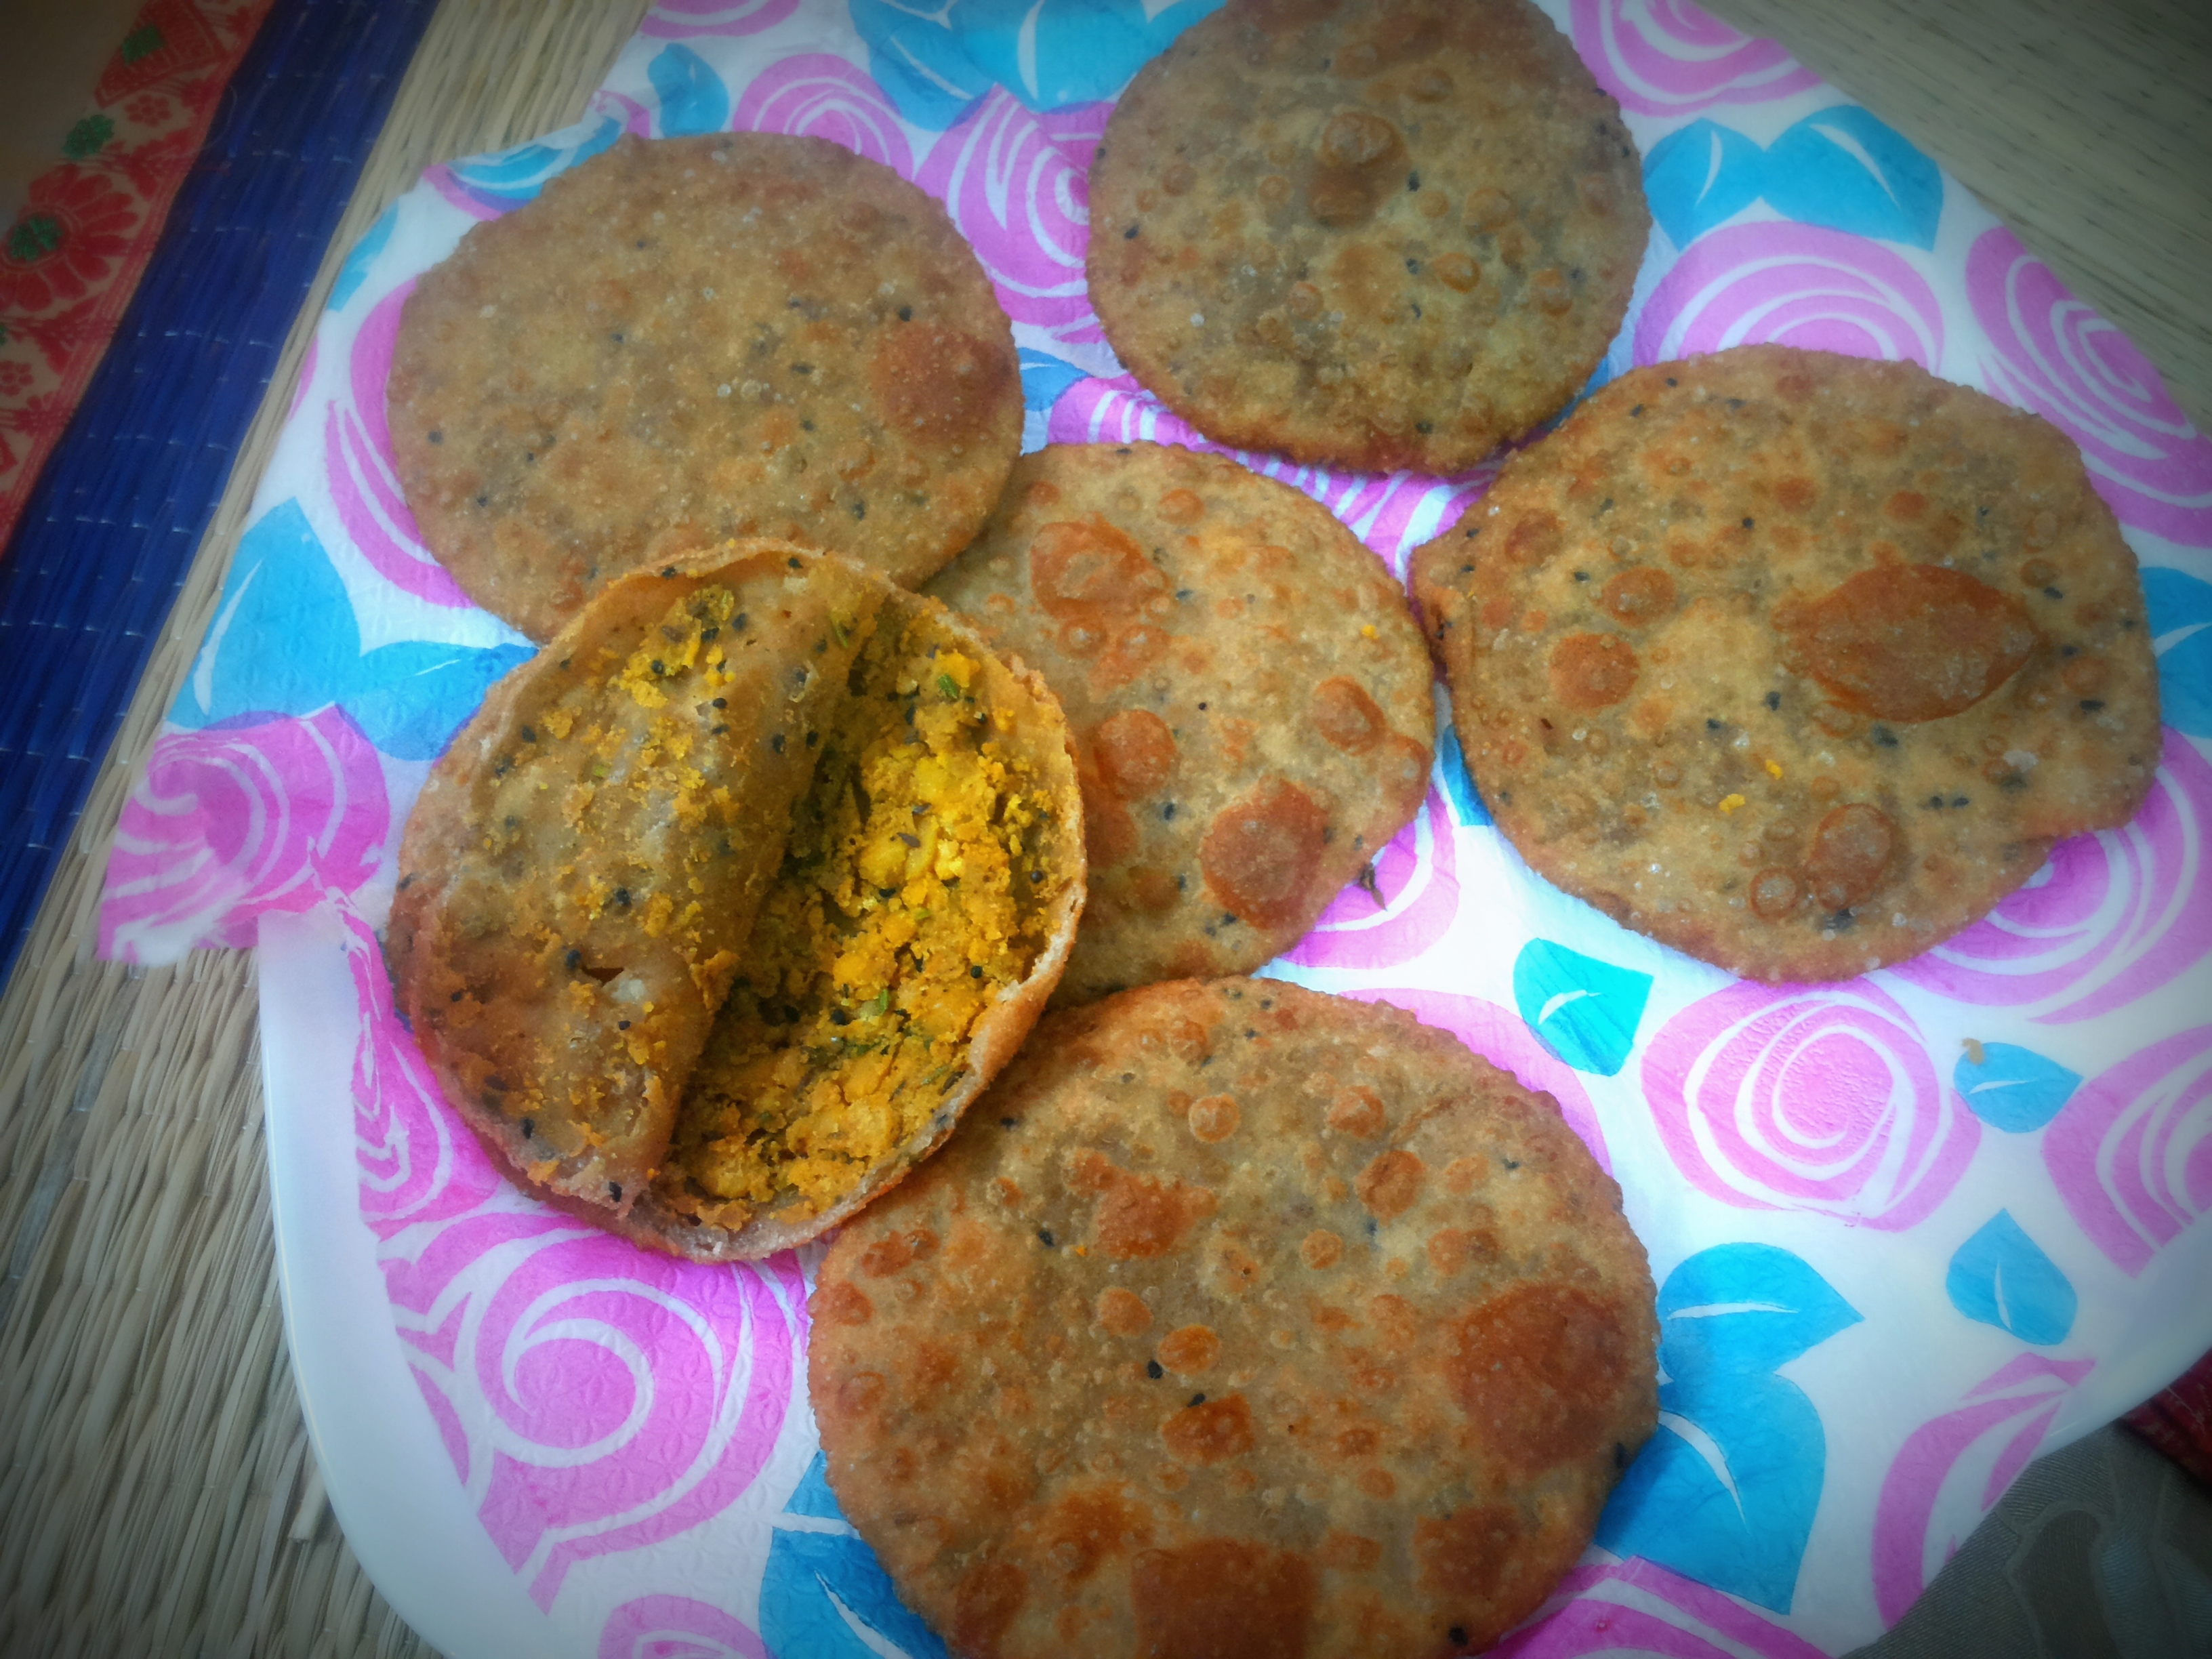 Dal (split chana/split Bengal gram) poori